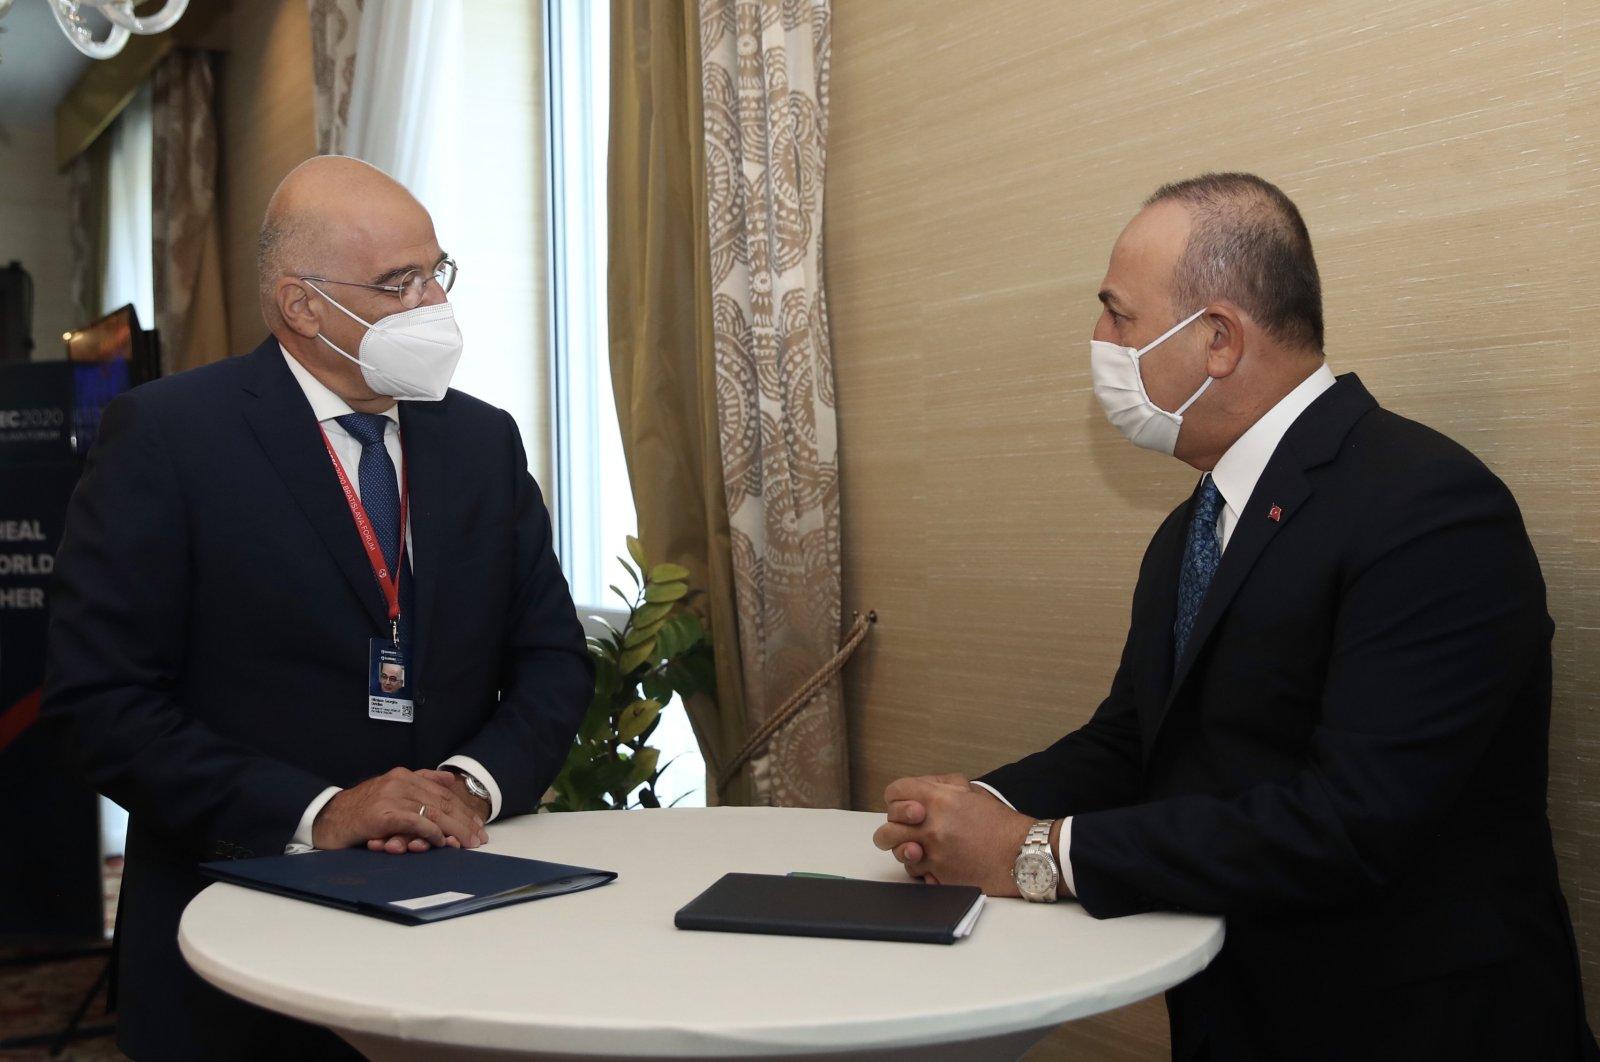 Greece's Foreign Minister Nikos Dendias (L) and Turkey's Foreign Minister Mevlüt Çavuşoğlu talk during a forum in Bratislava, Slovakia, Oct. 9, 2020. (AA Photo)